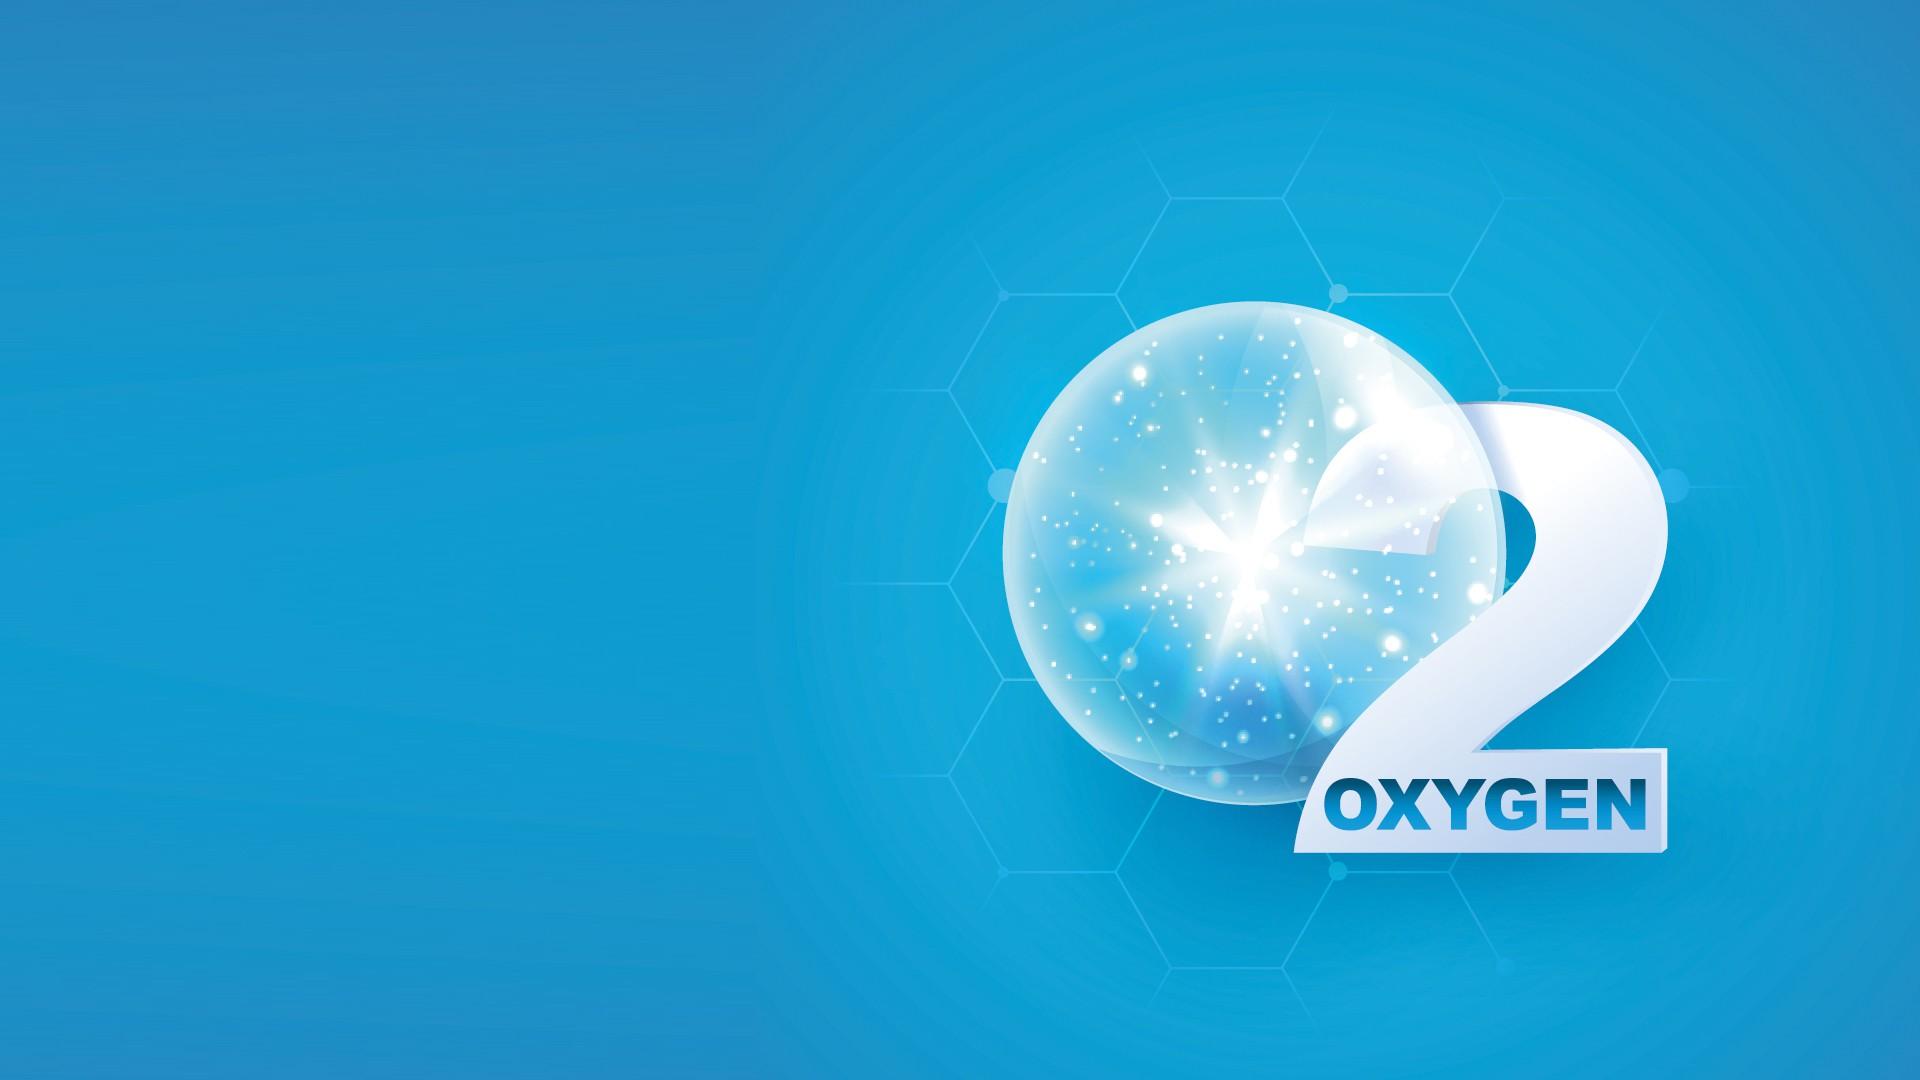 Oxylife and Oxyata Oxygen System